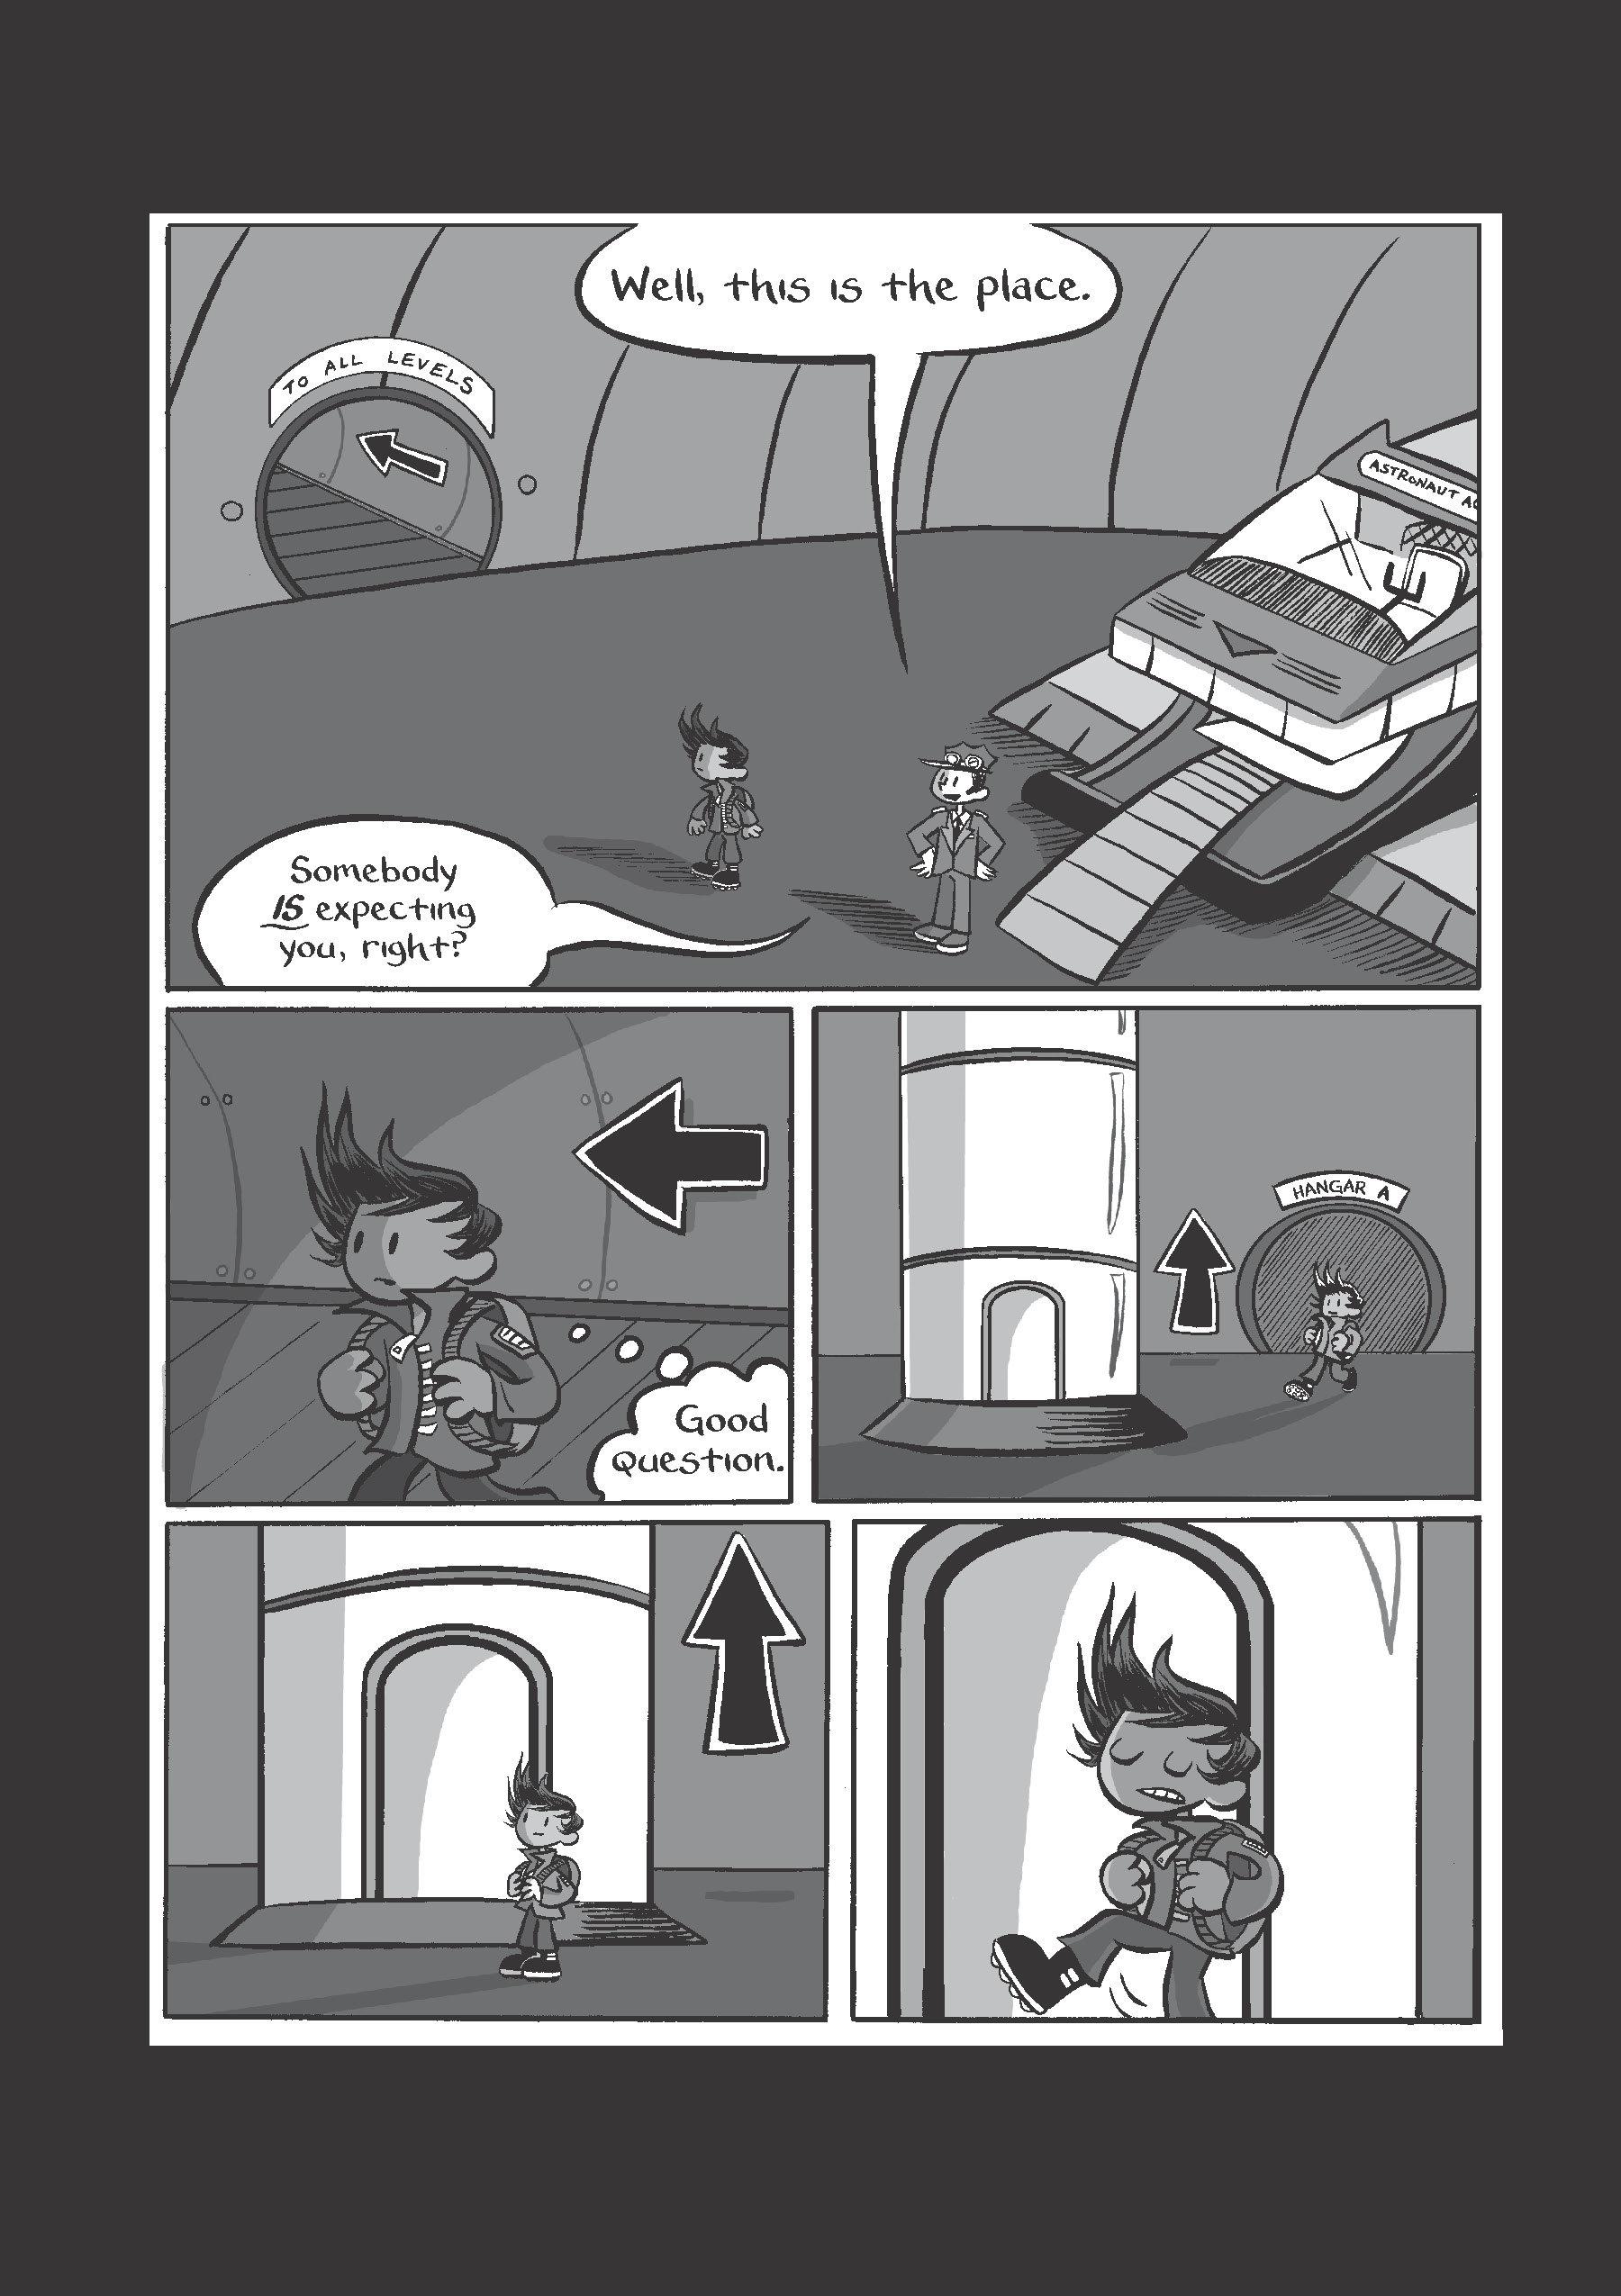 Monkey Astronaut Joke - Pics about space